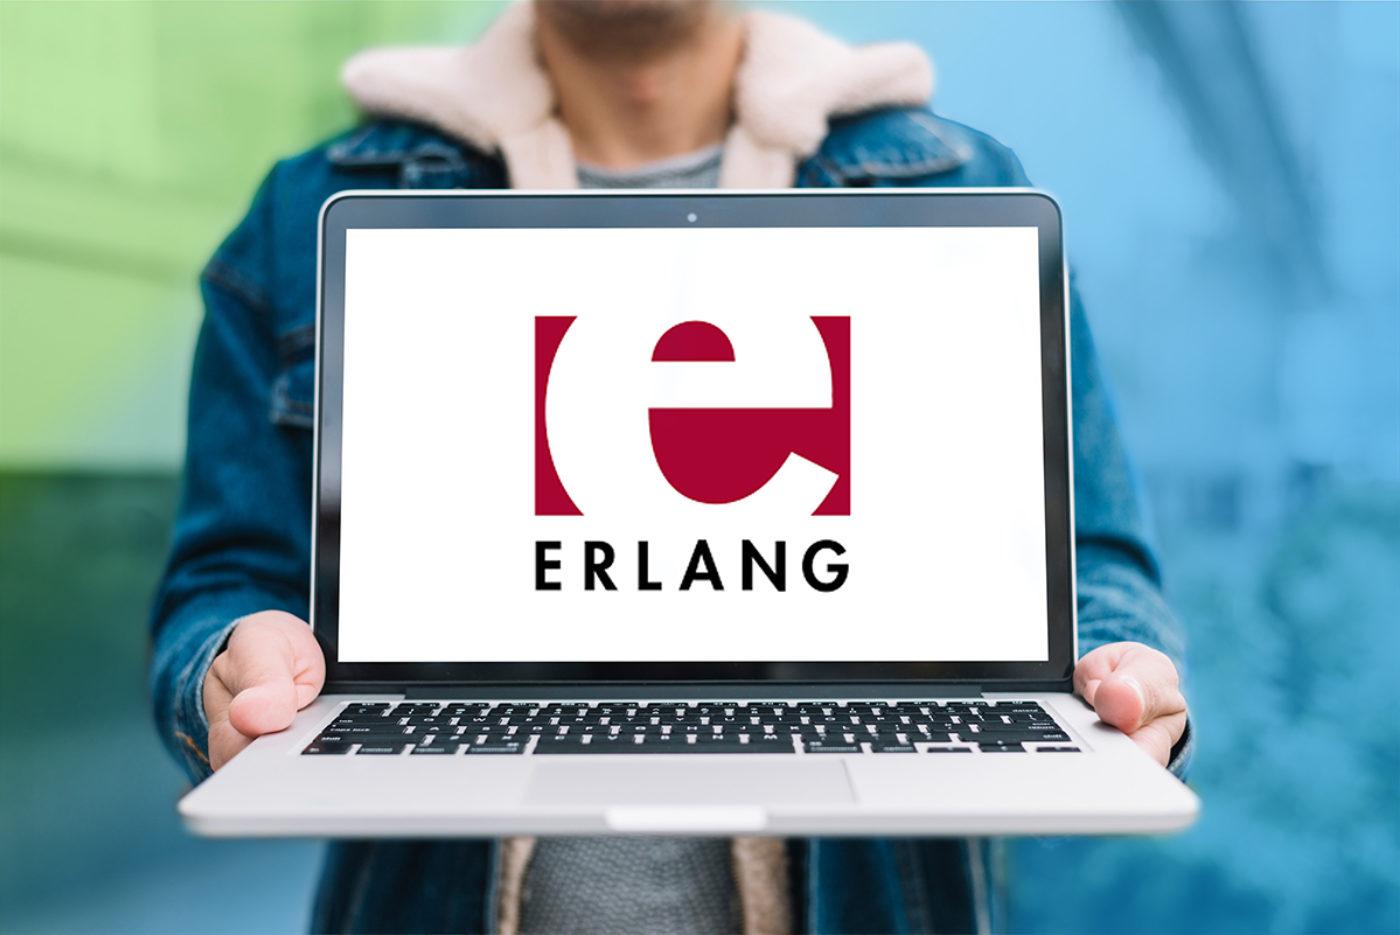 Мероприятия: Мастер-класс «Феномен Erlang» в Днепре